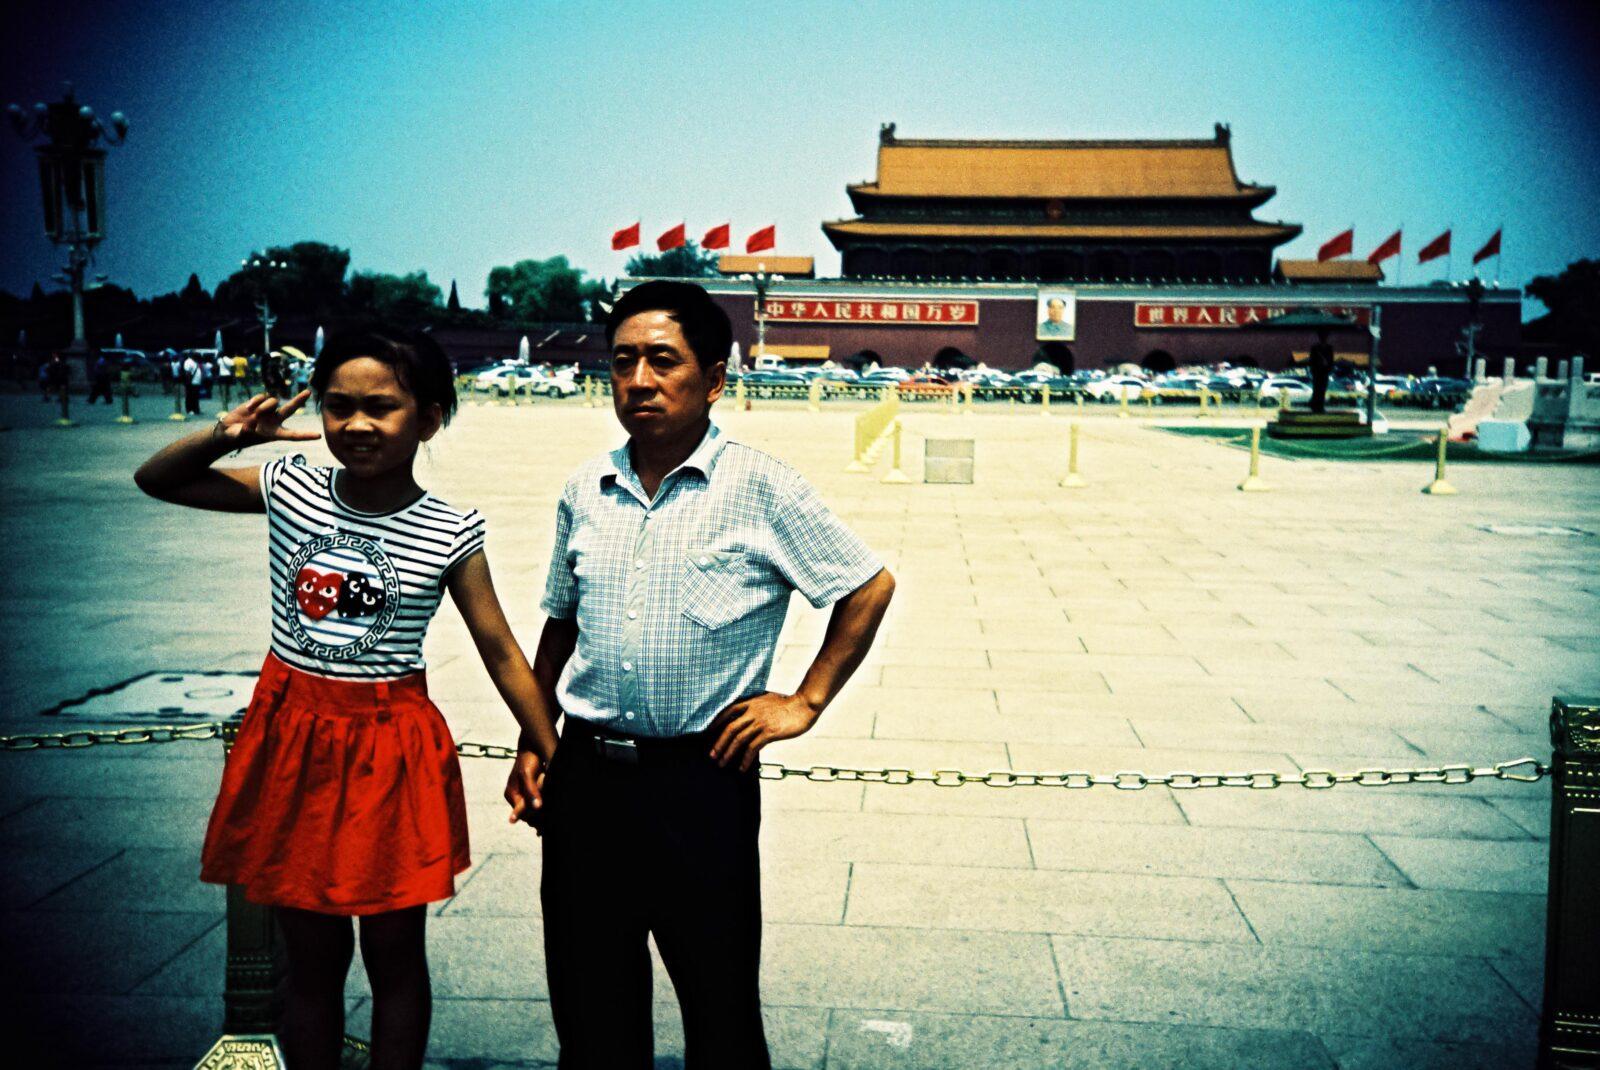 instaCDV 15 China roll11 Beijing ForbiddenCity 000010